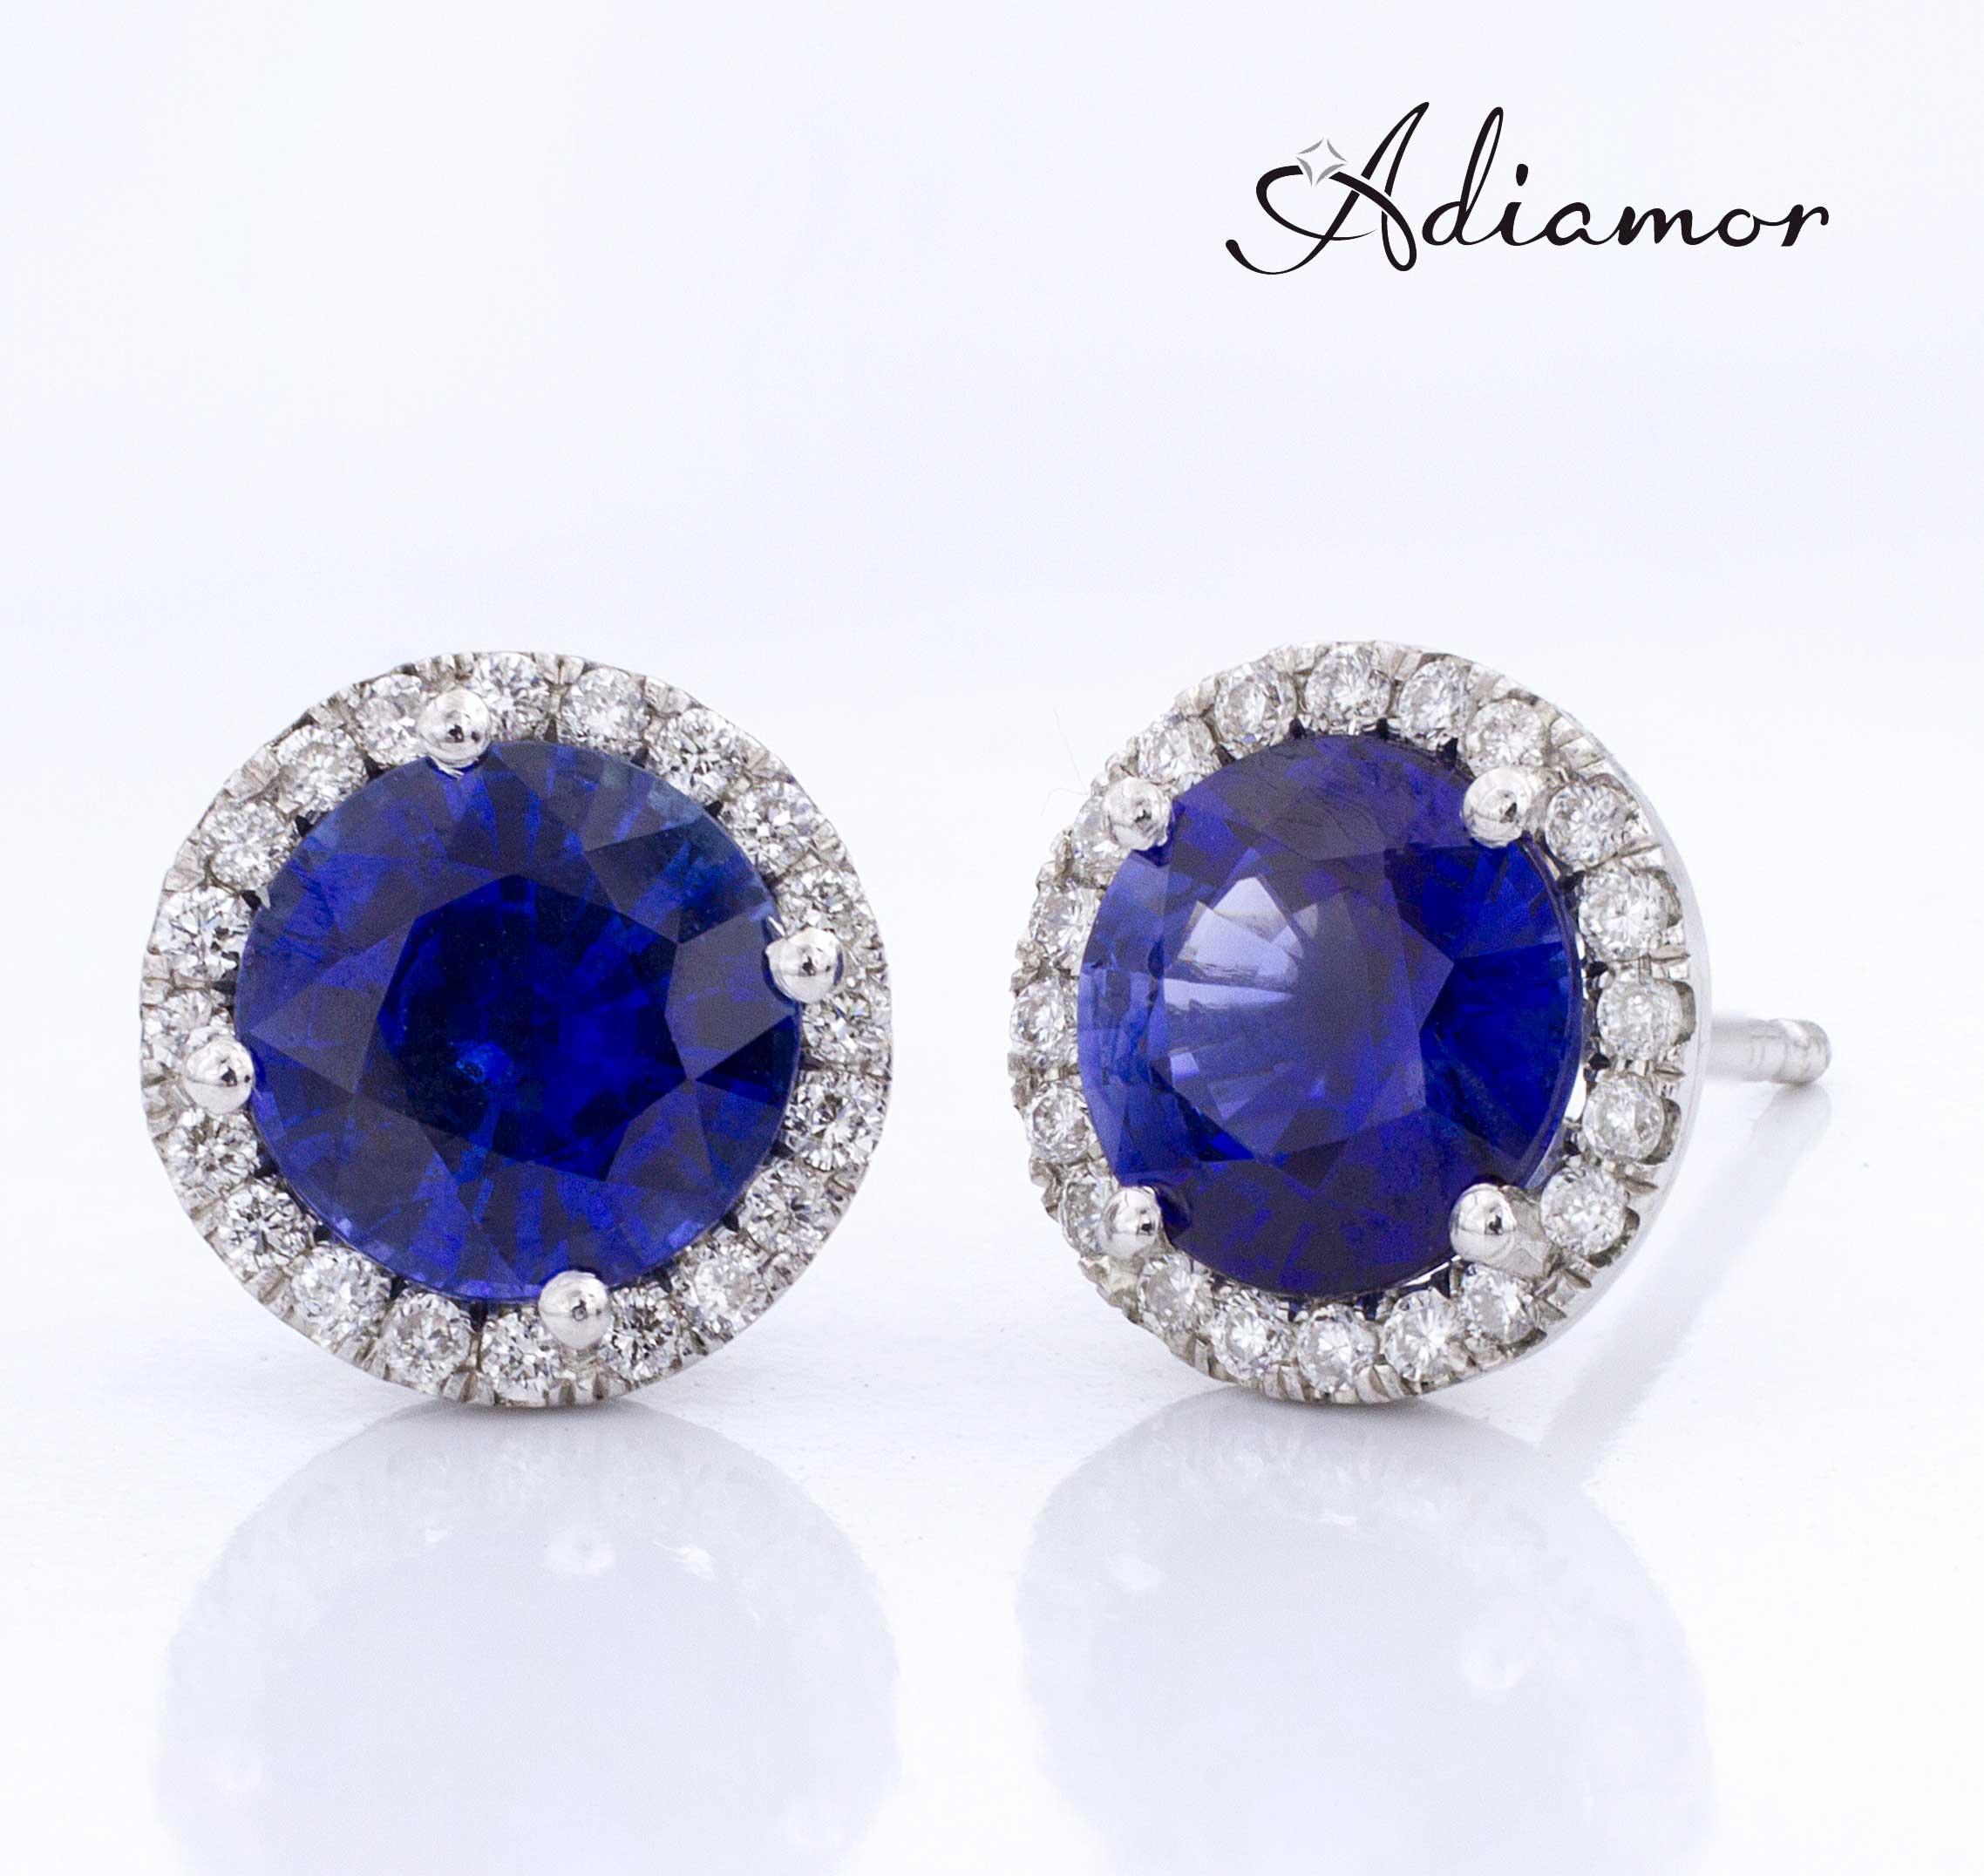 Adiamor's Sapphire Diamond Halo Earrings